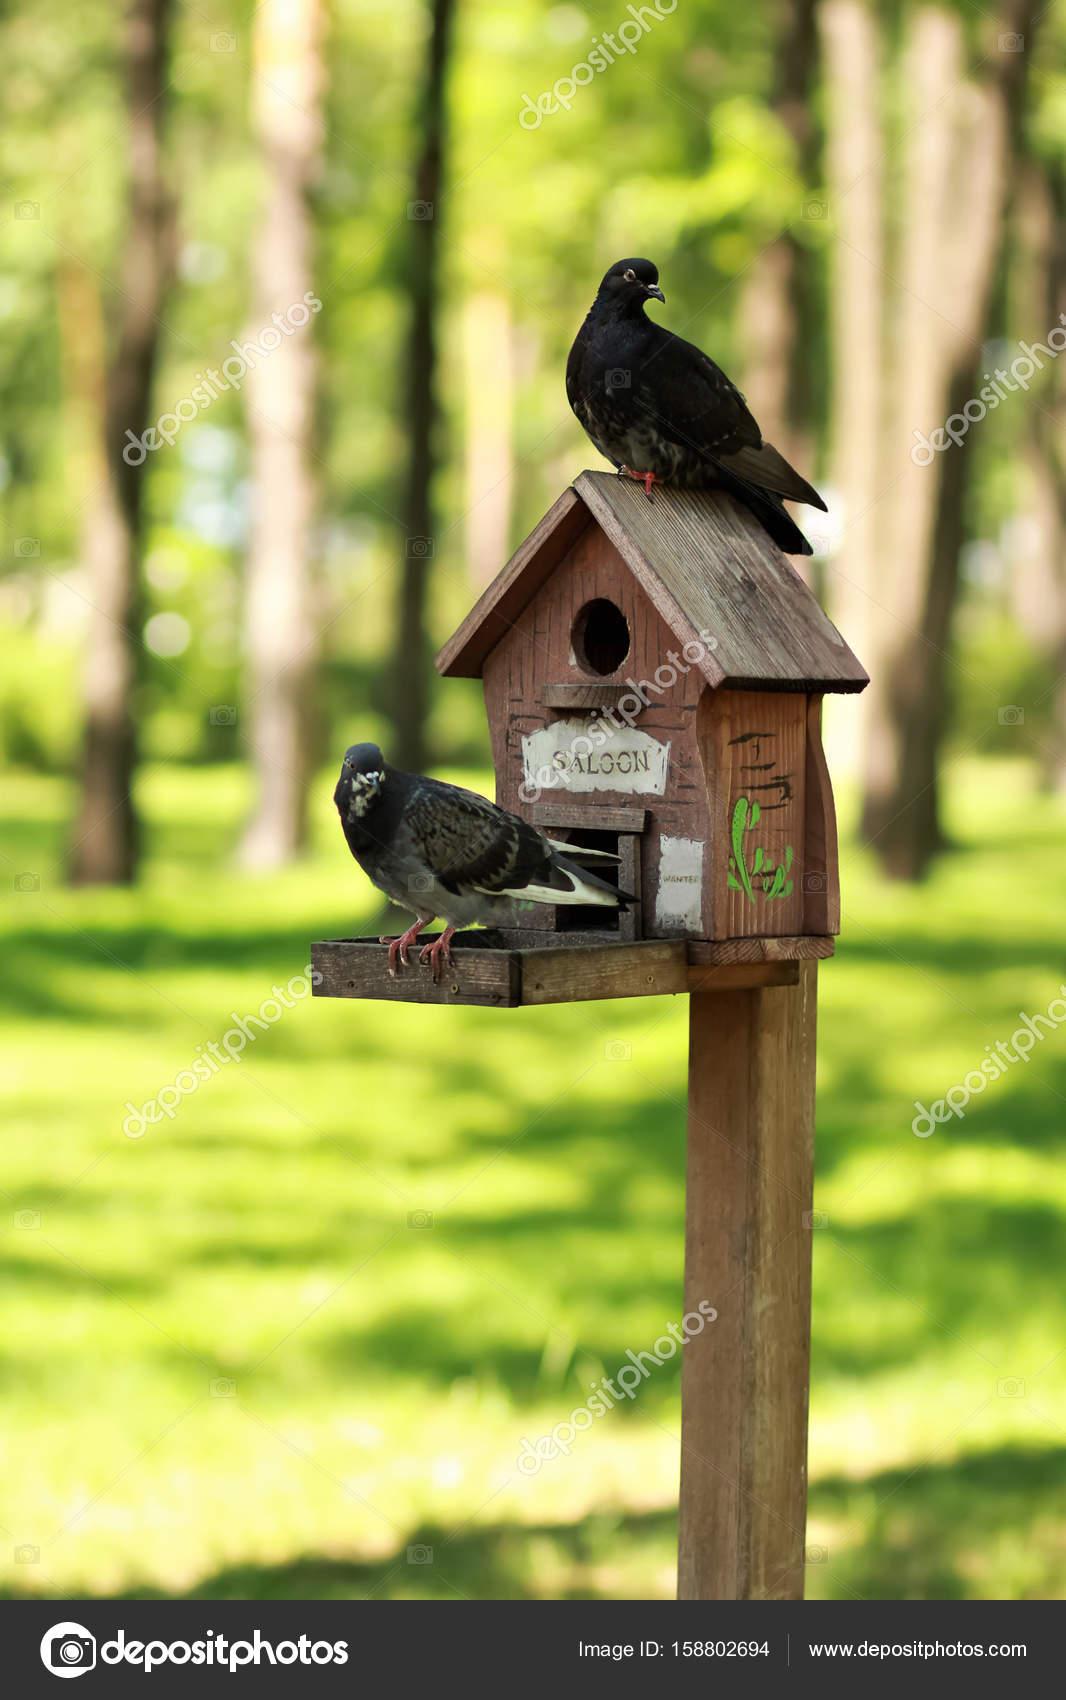 bird com best amazon natural design ihl feeders outdoor home wooden dp garden products feeder bed fir wood breakfast